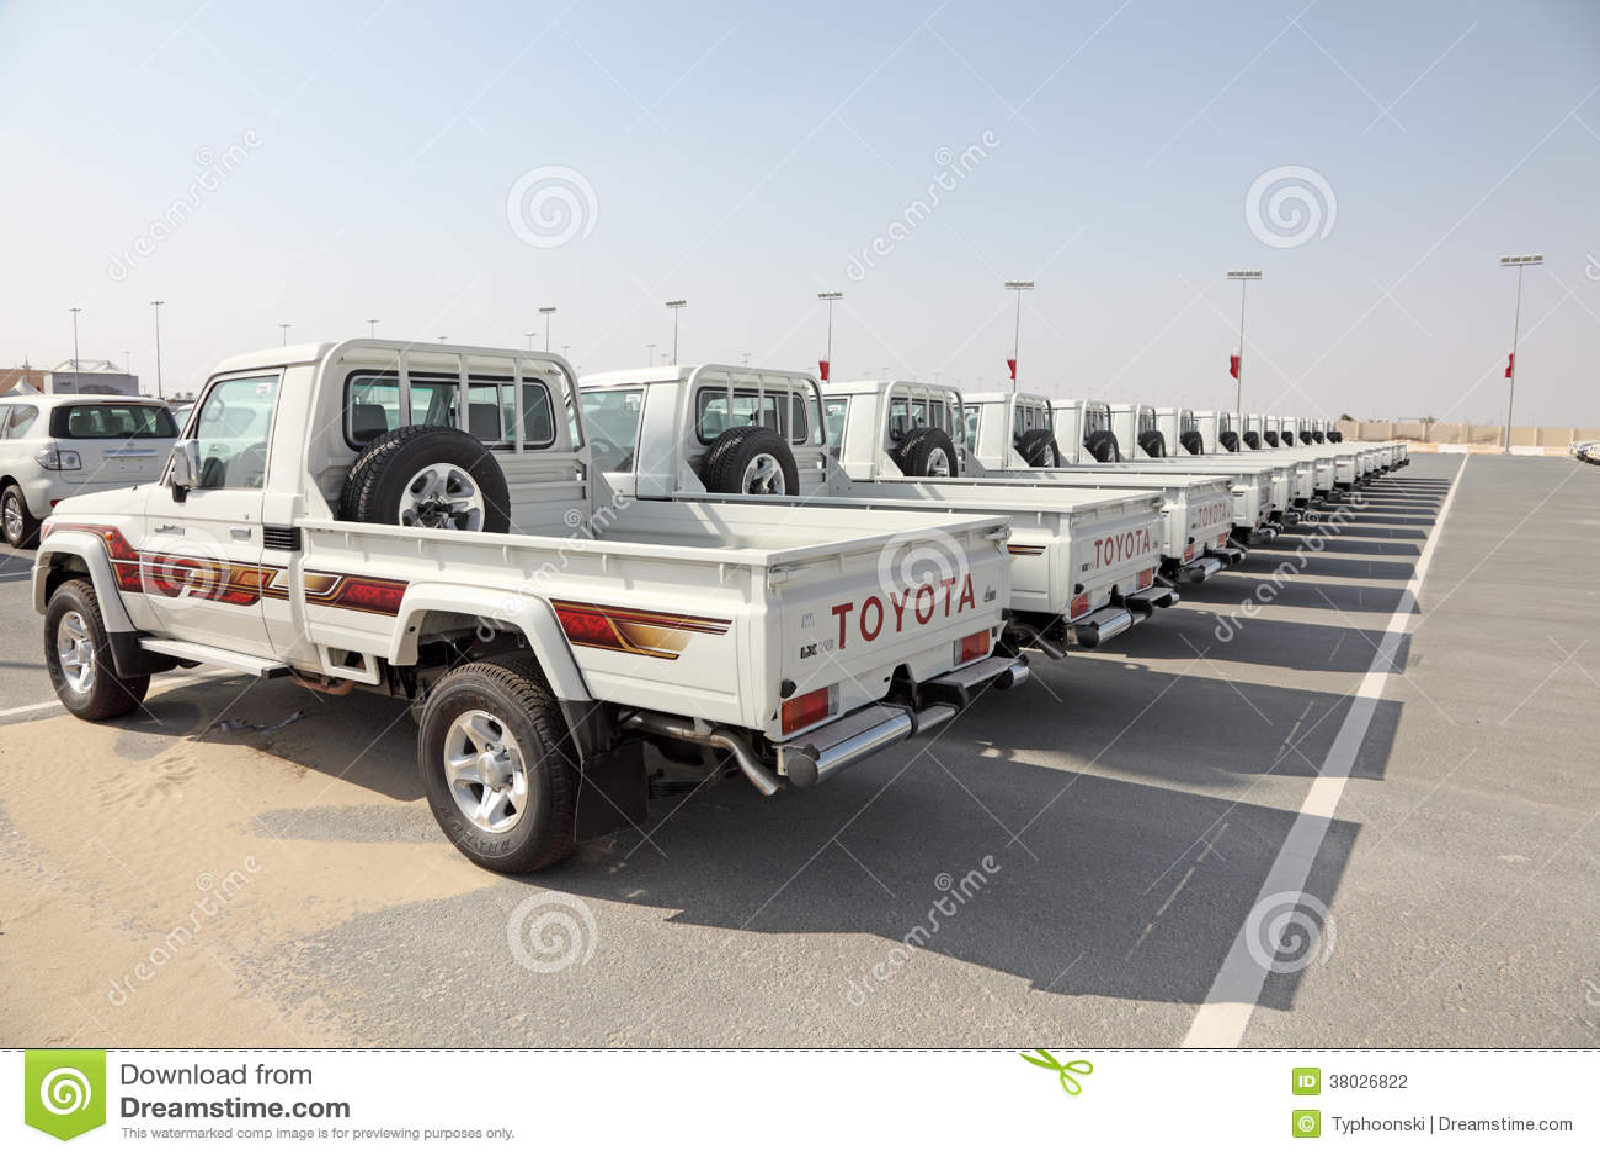 toyota land cruiser pickup trucks editorial photography